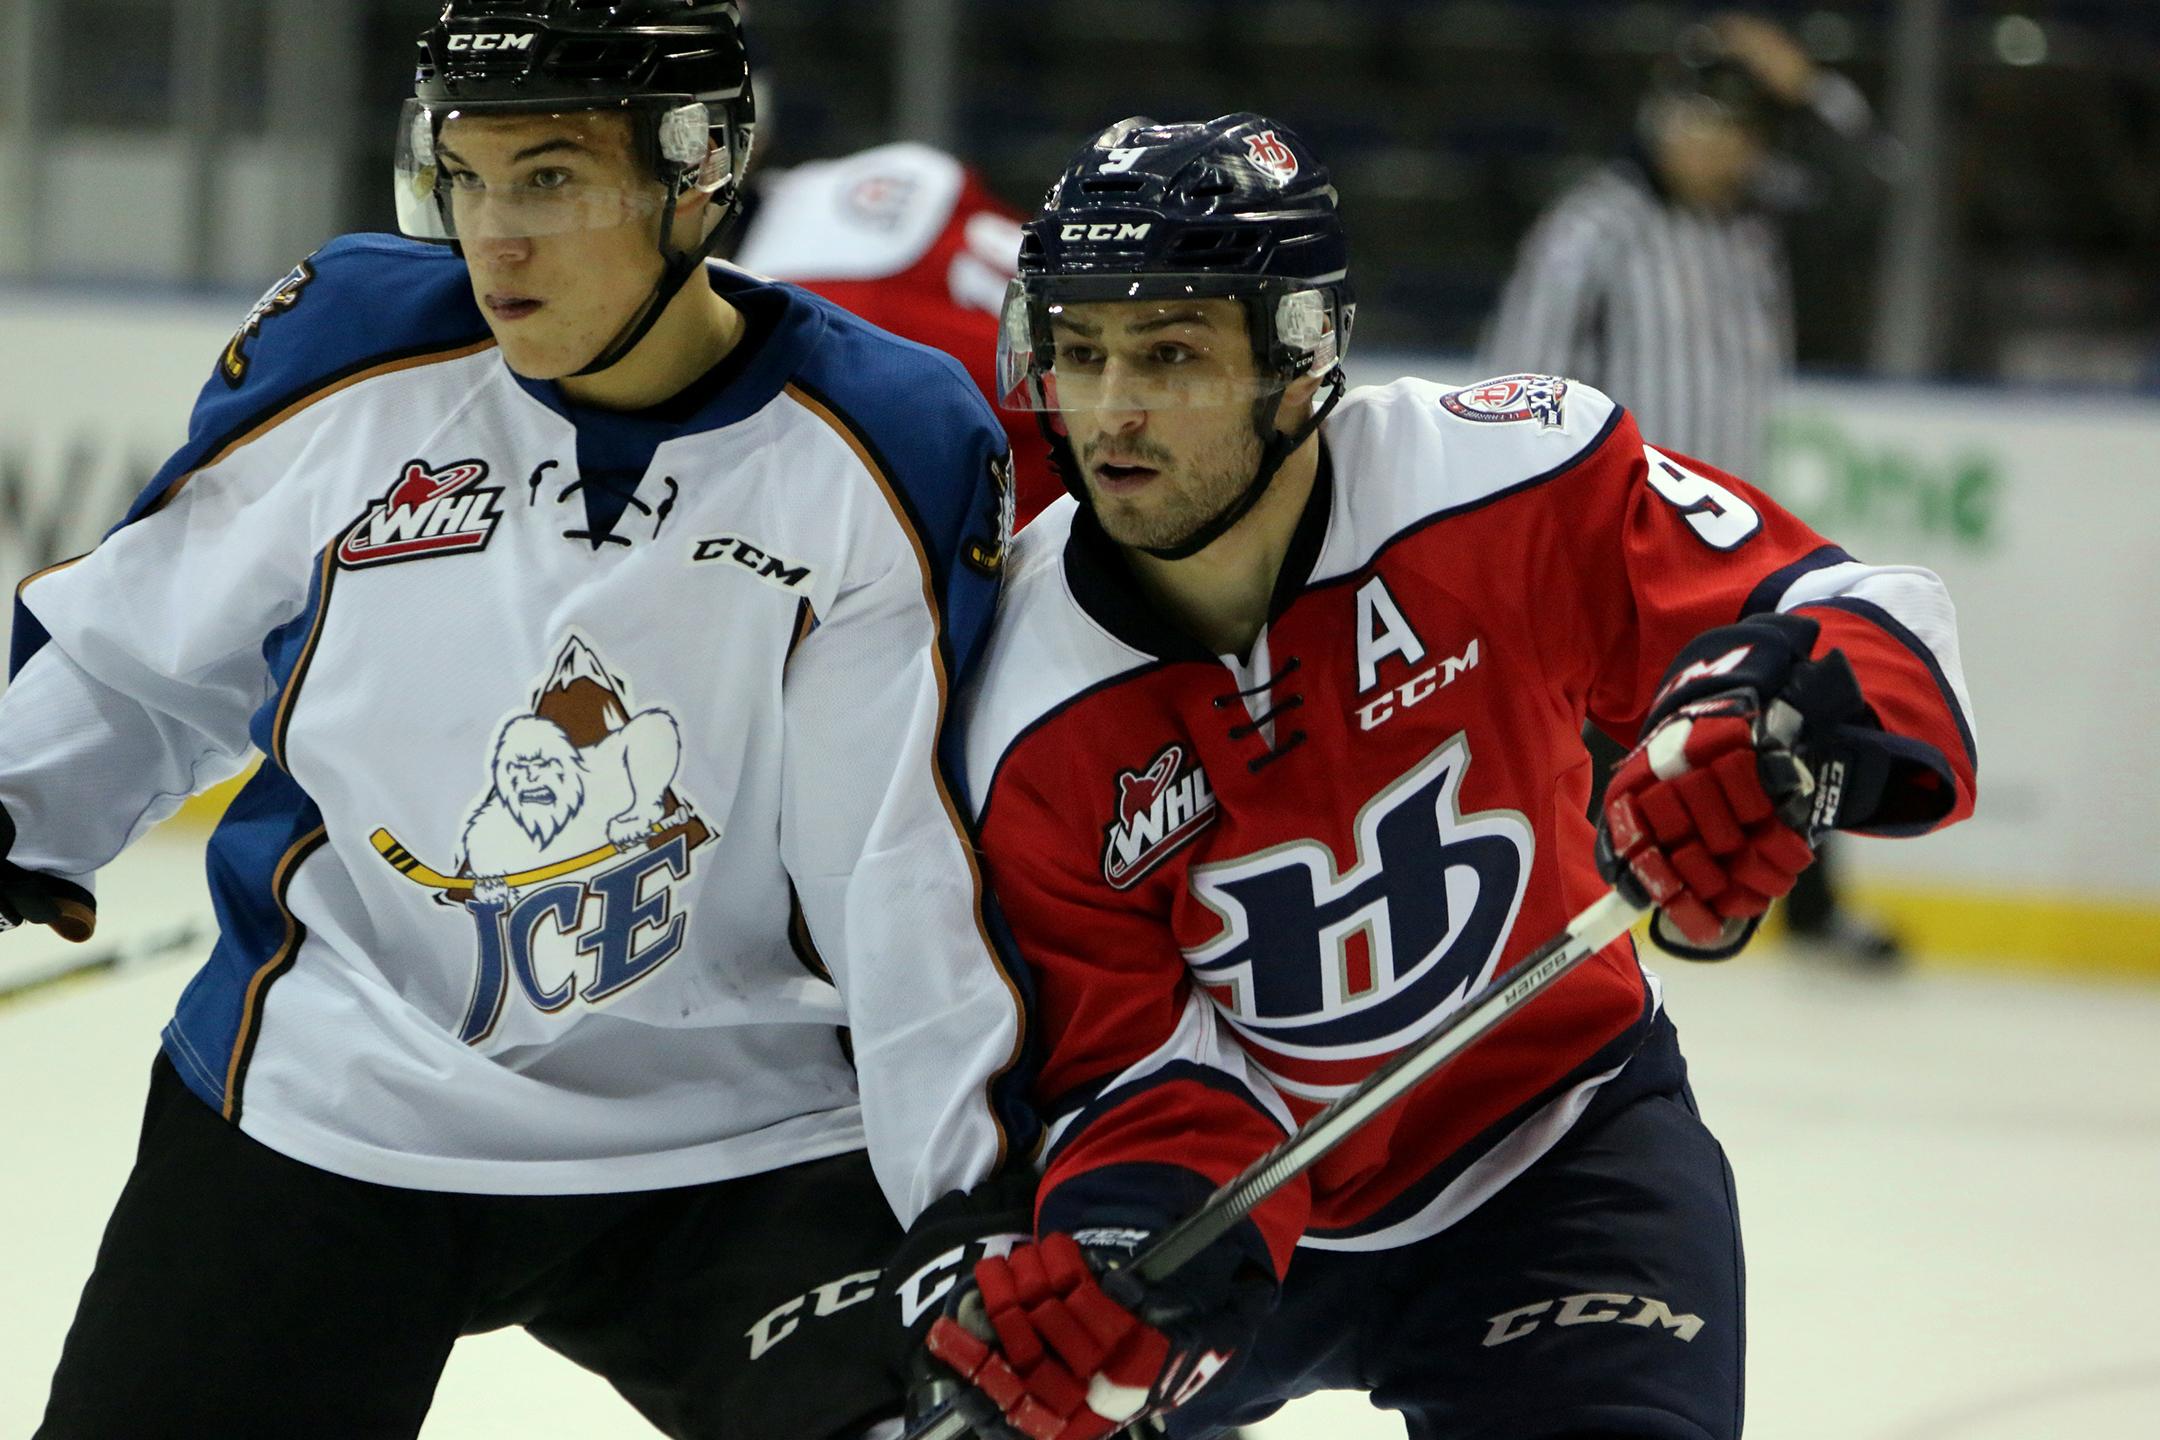 Giorgio Estephan begins the WHL playoffs with Lethbridge this week. (Cindy Adachi)